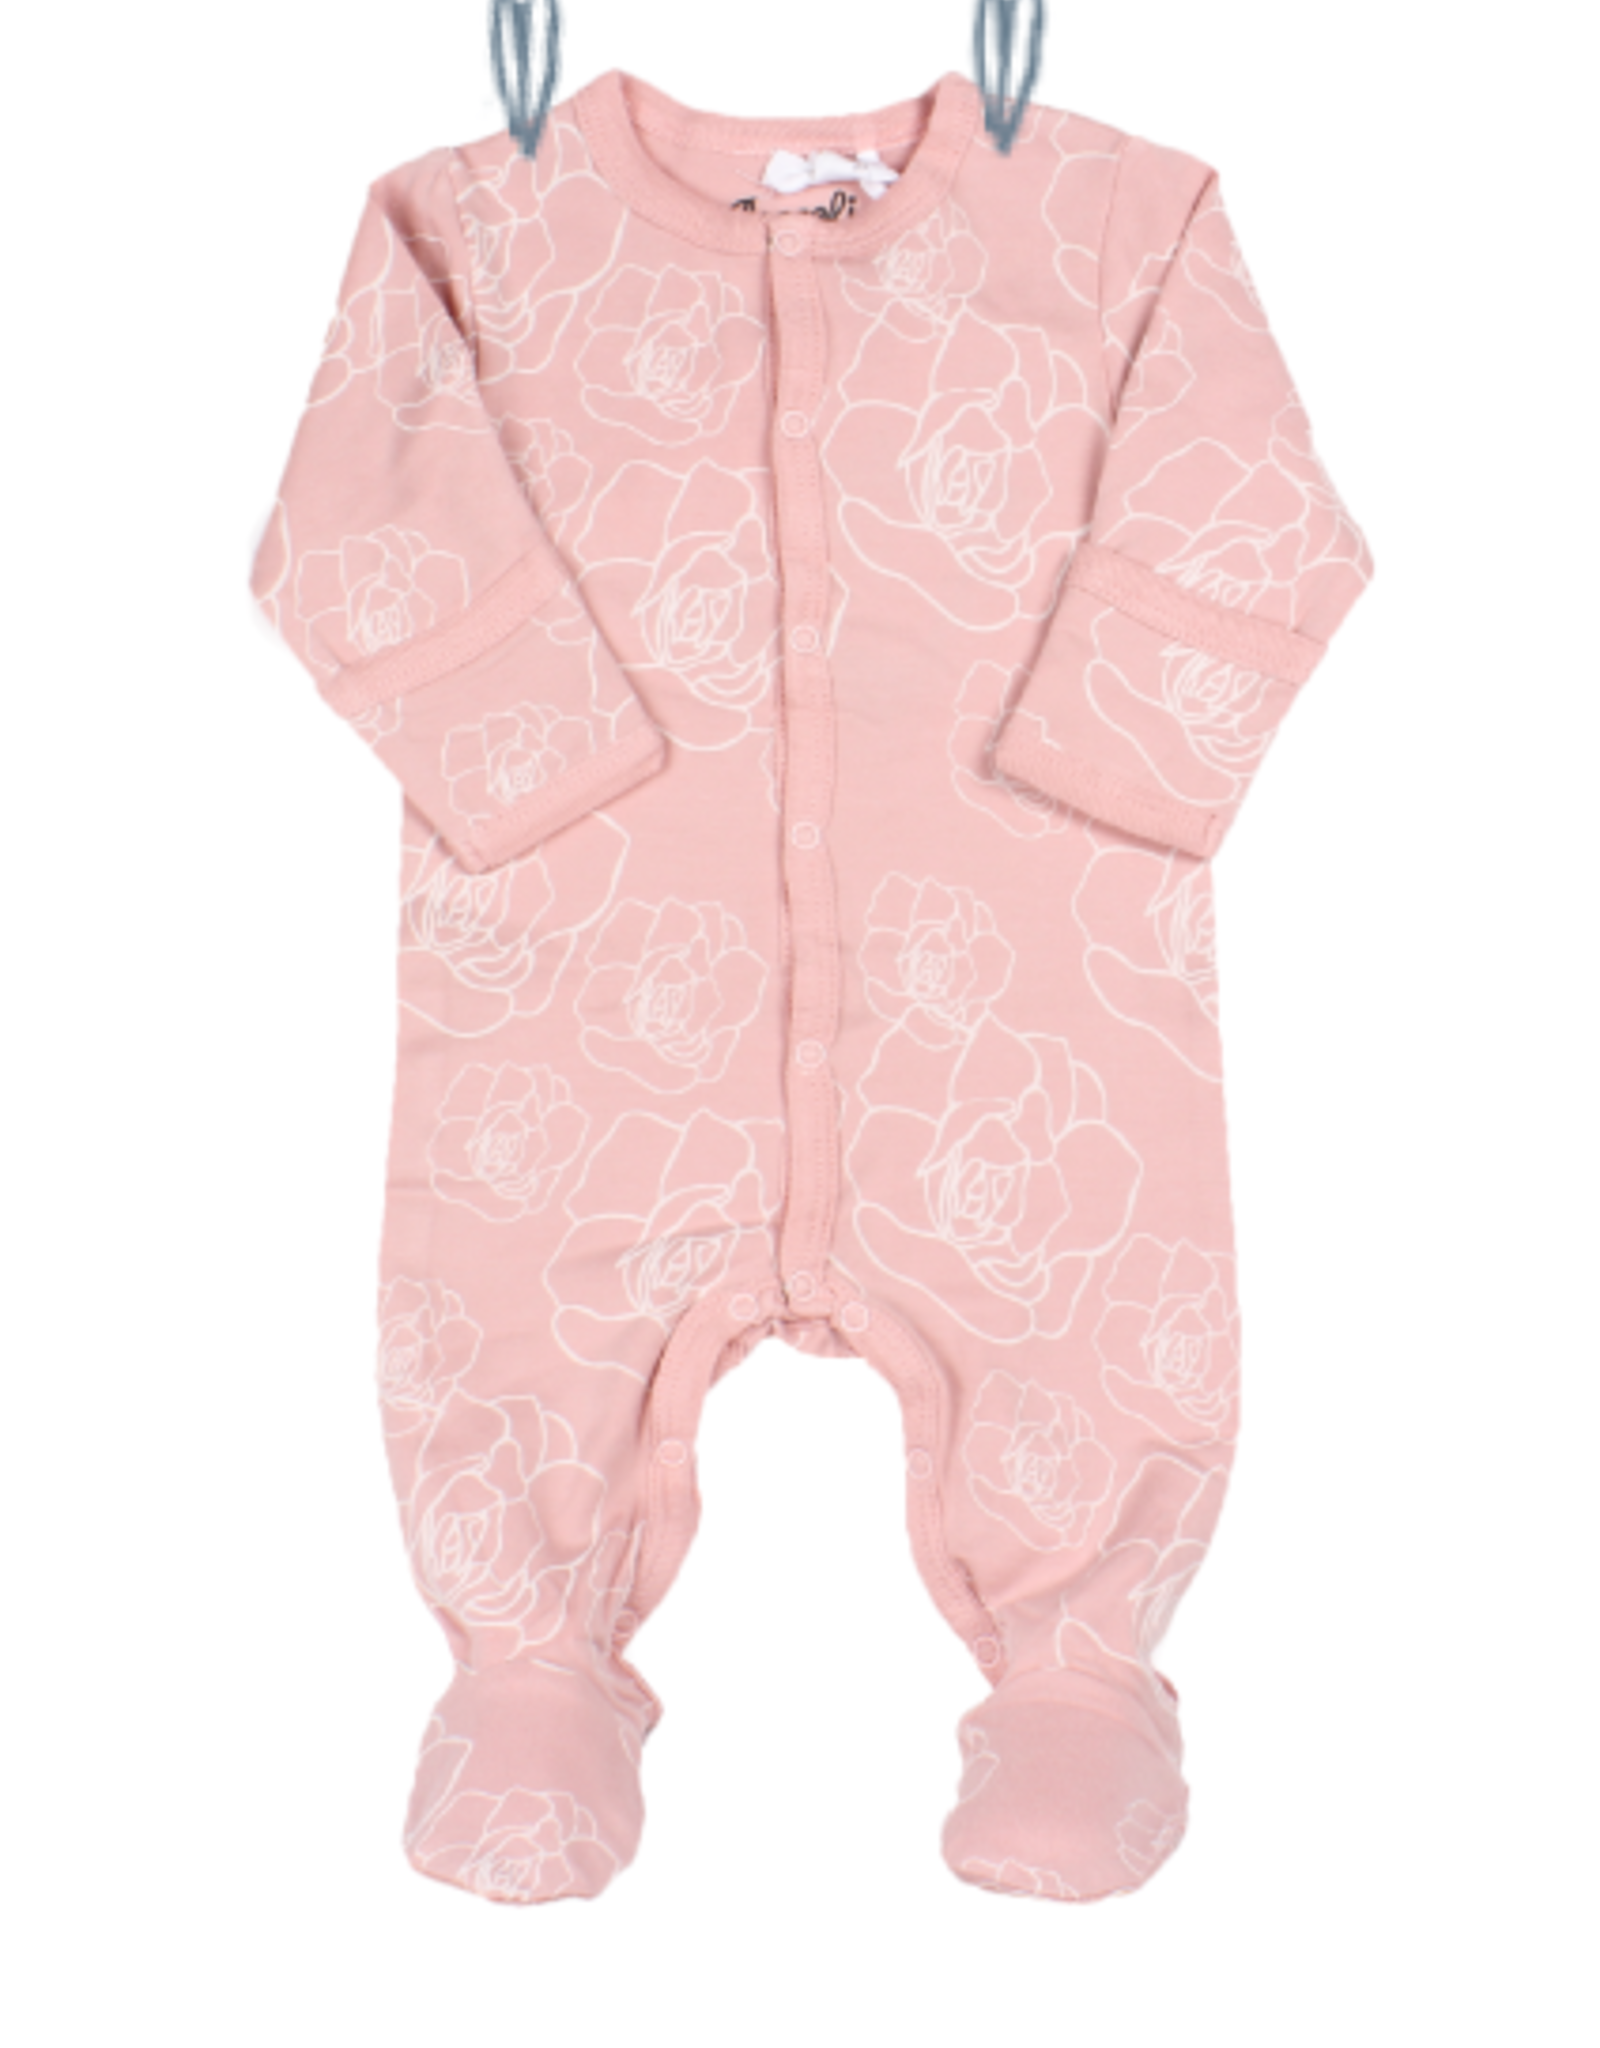 Coccoli SP21 Pink Rose Zip Sleeper